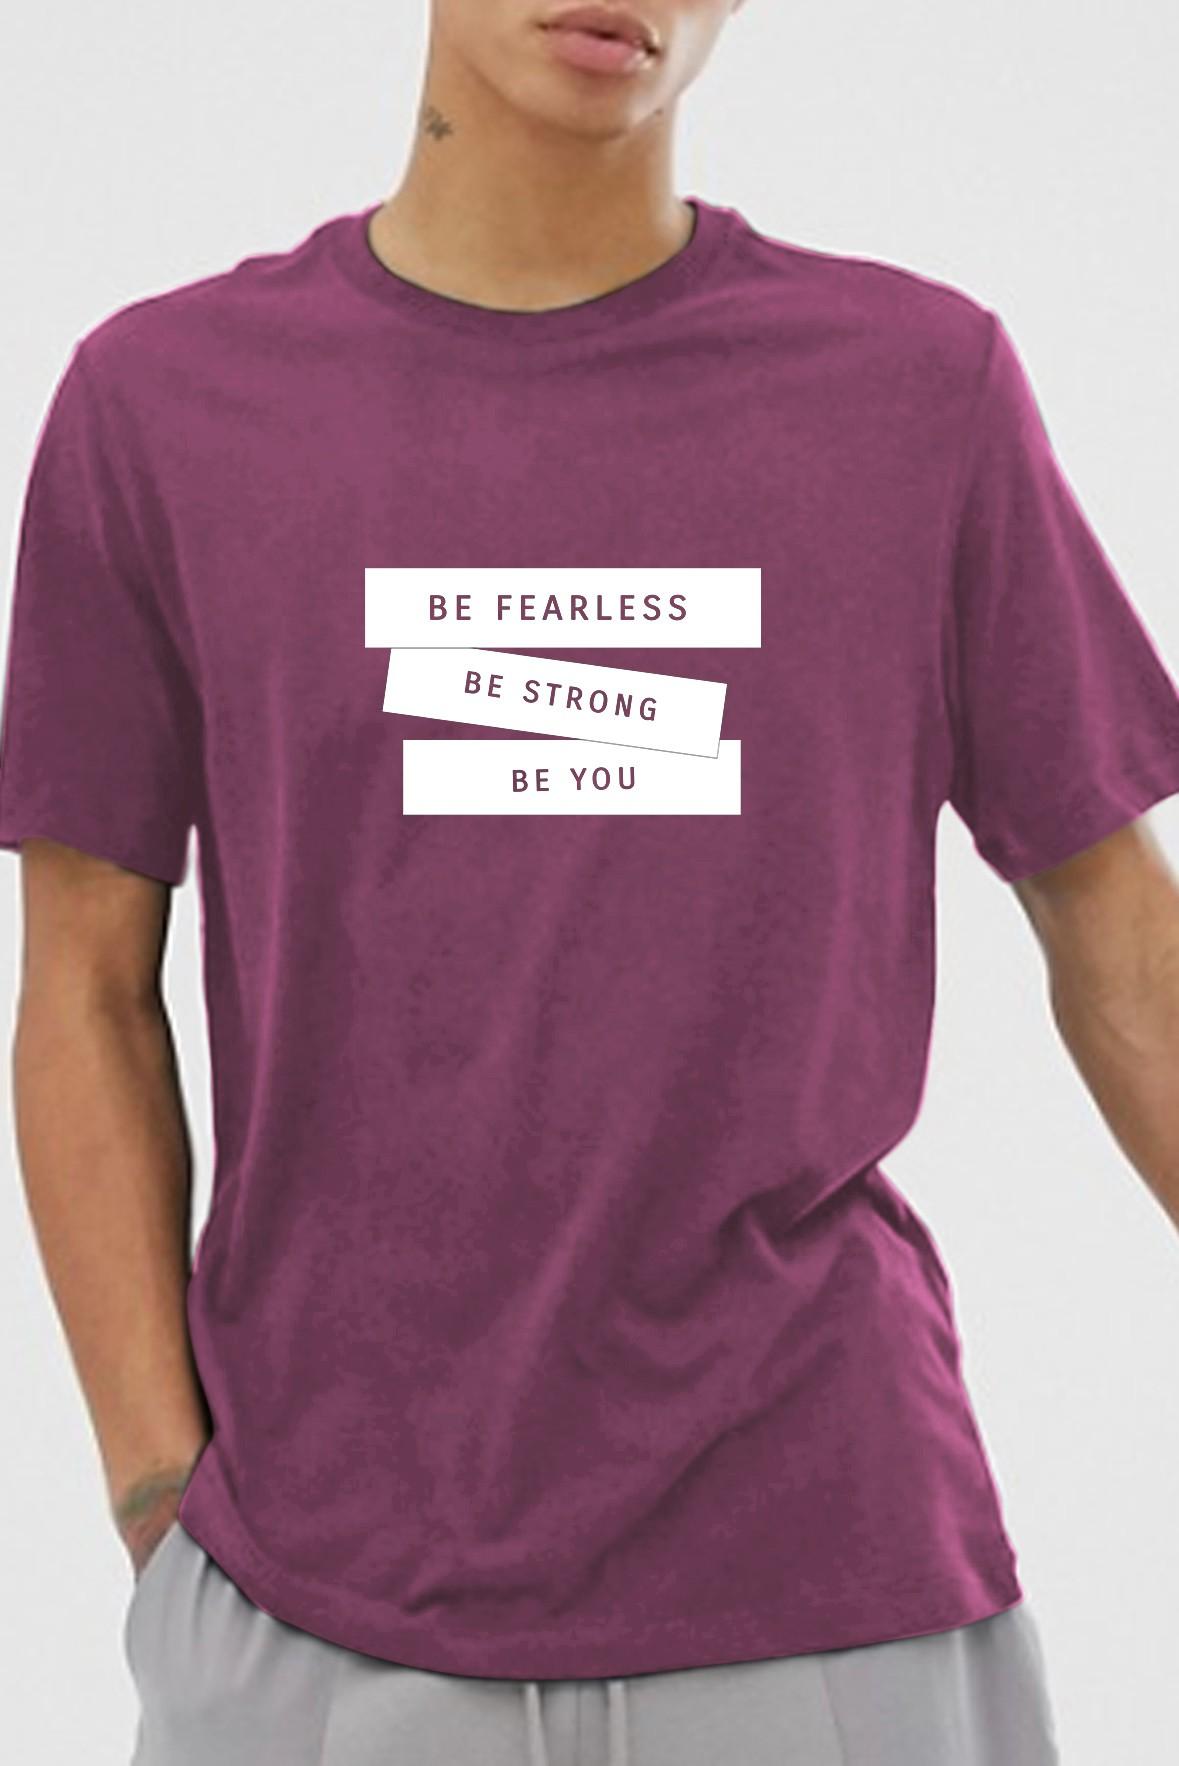 Be fearless purple